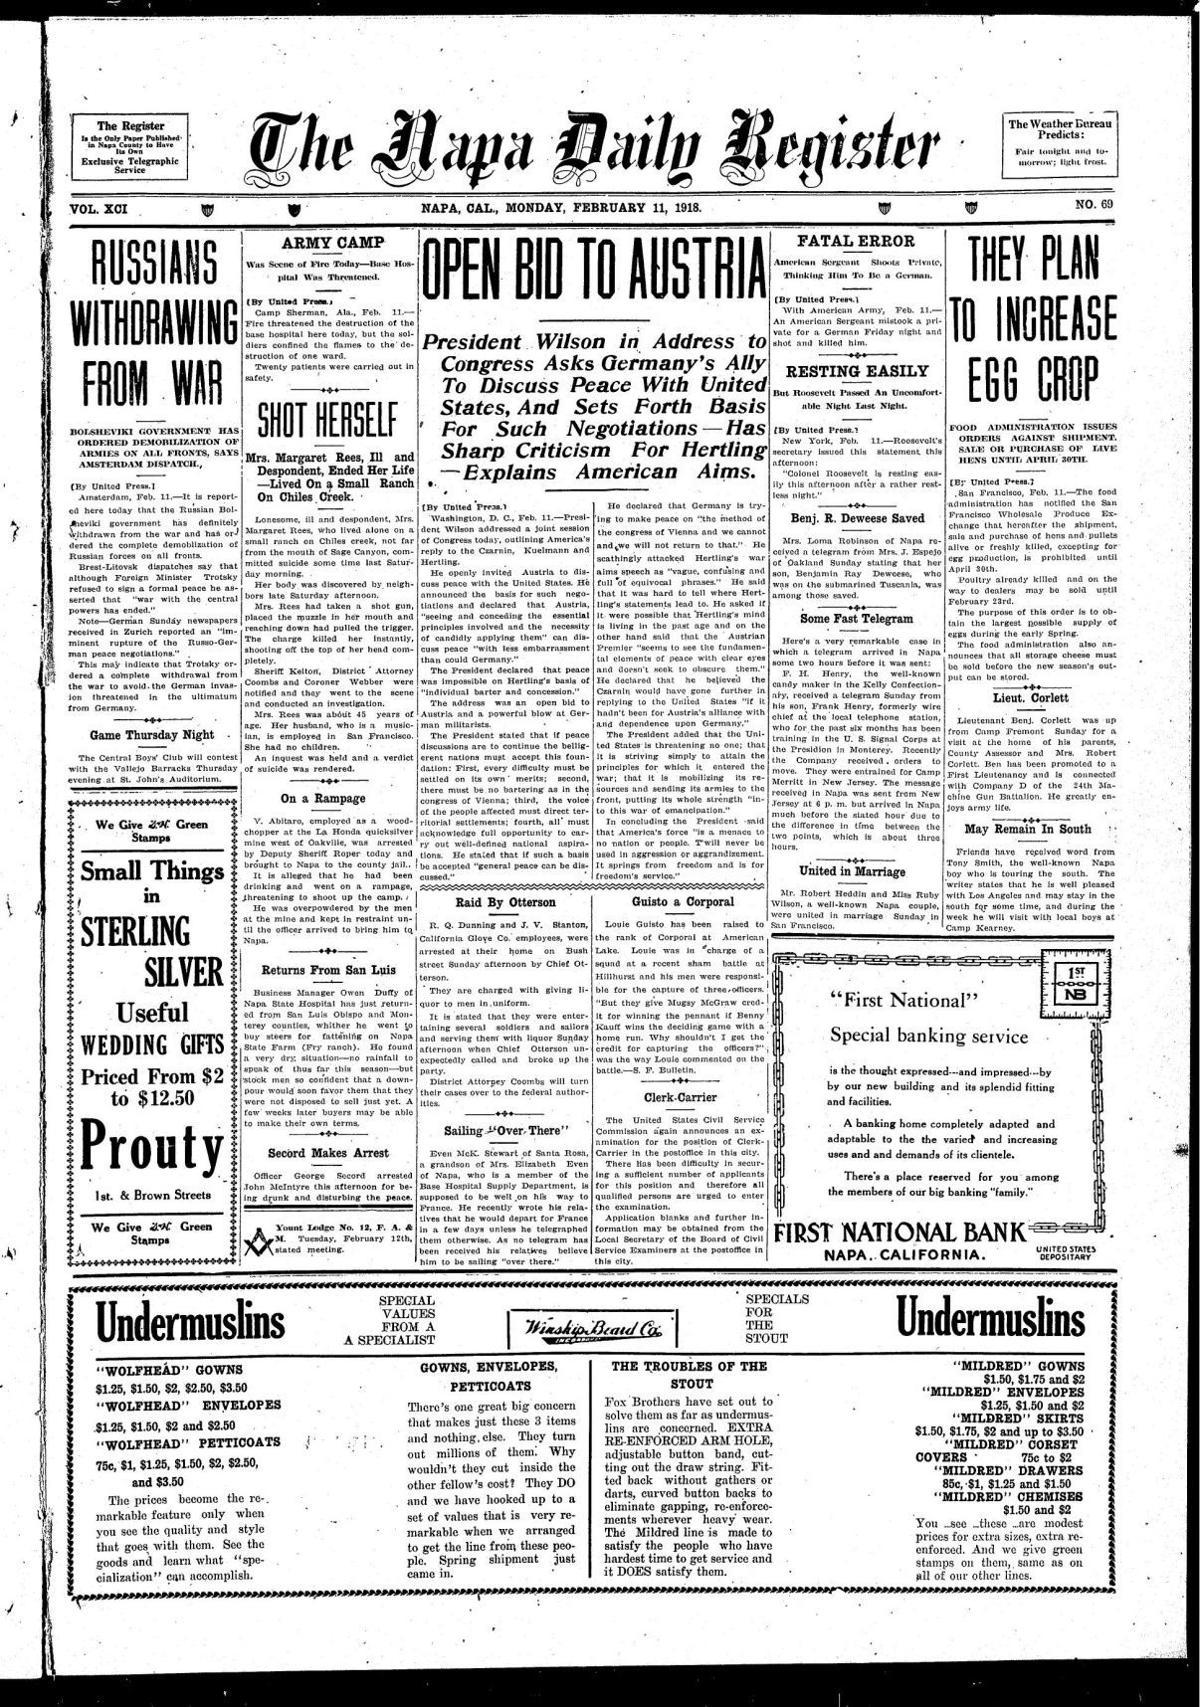 Feb. 11, 1918